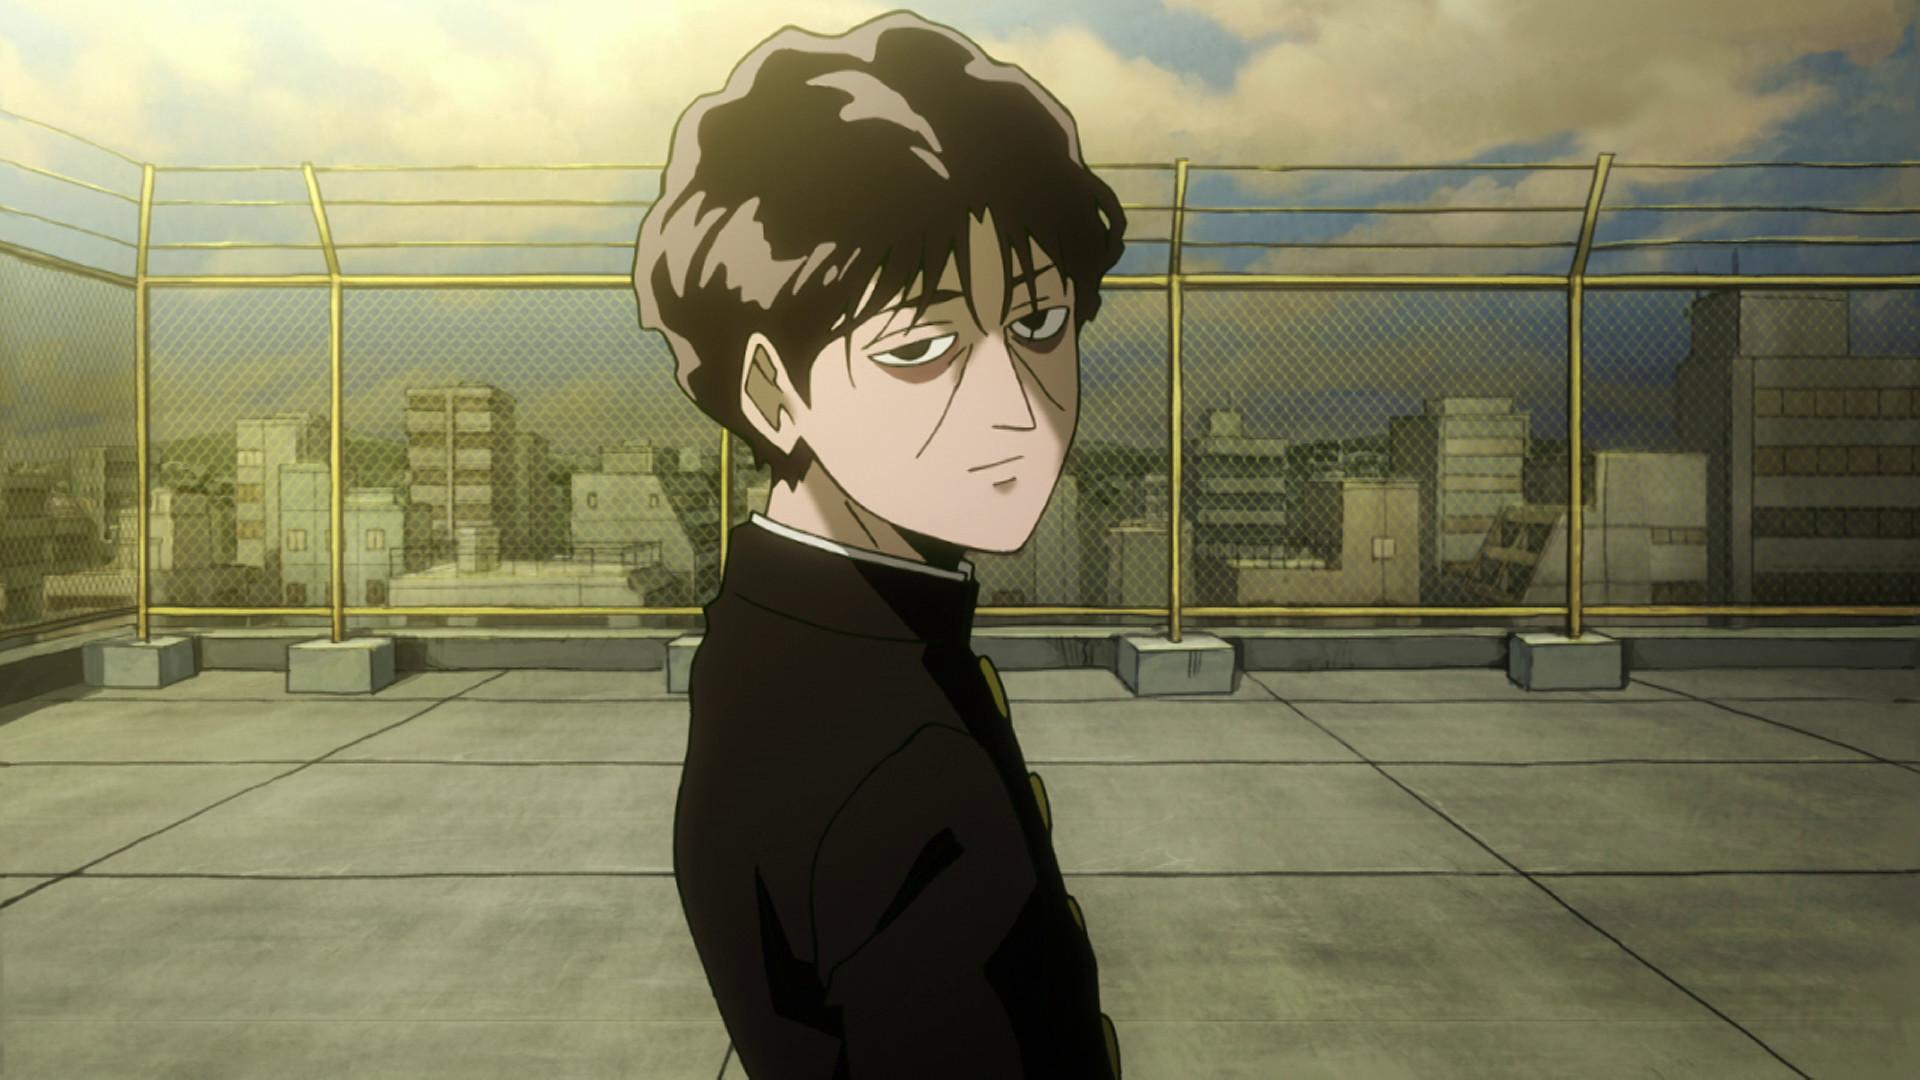 Watch Mob Psycho 100 Season 1 Episode 7 Dub | Anime